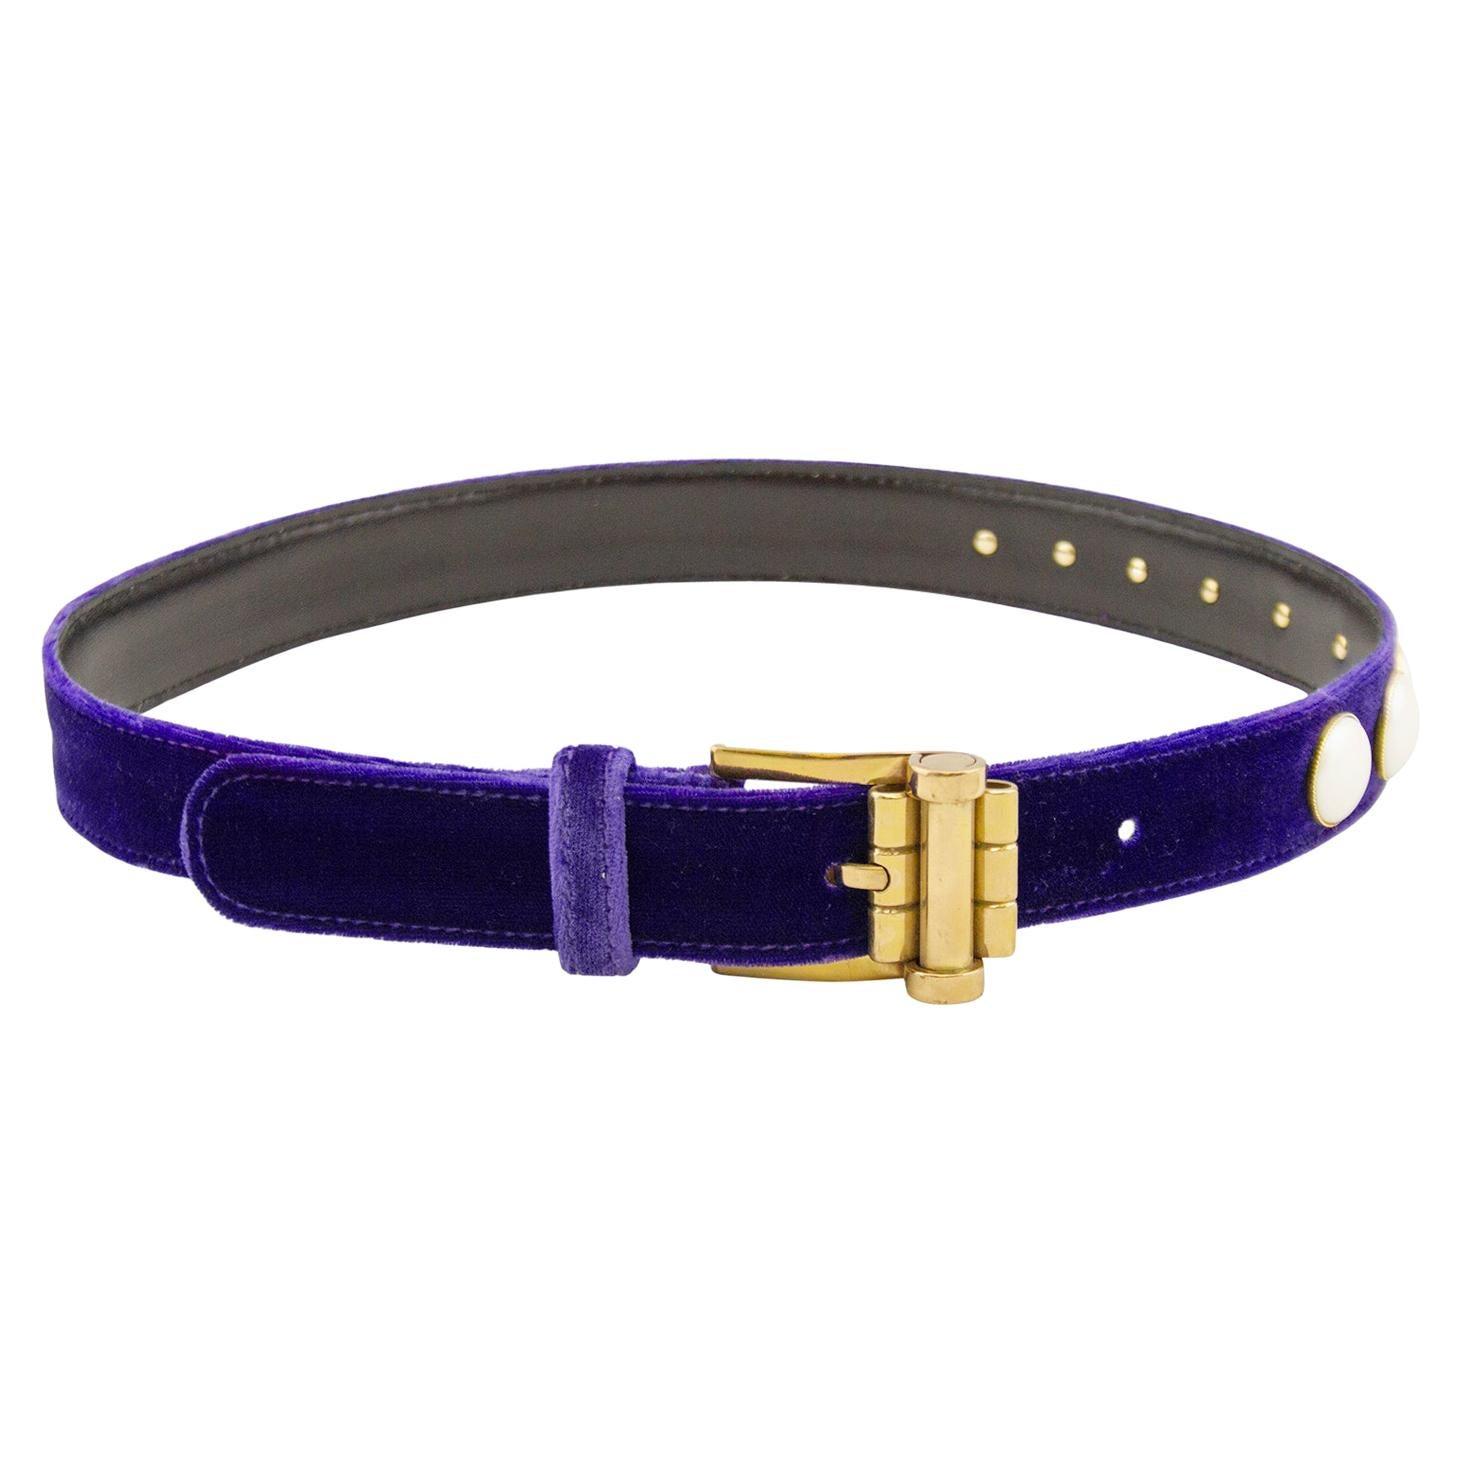 1990s Gianni Versace Purple Velvet and Pearl Belt